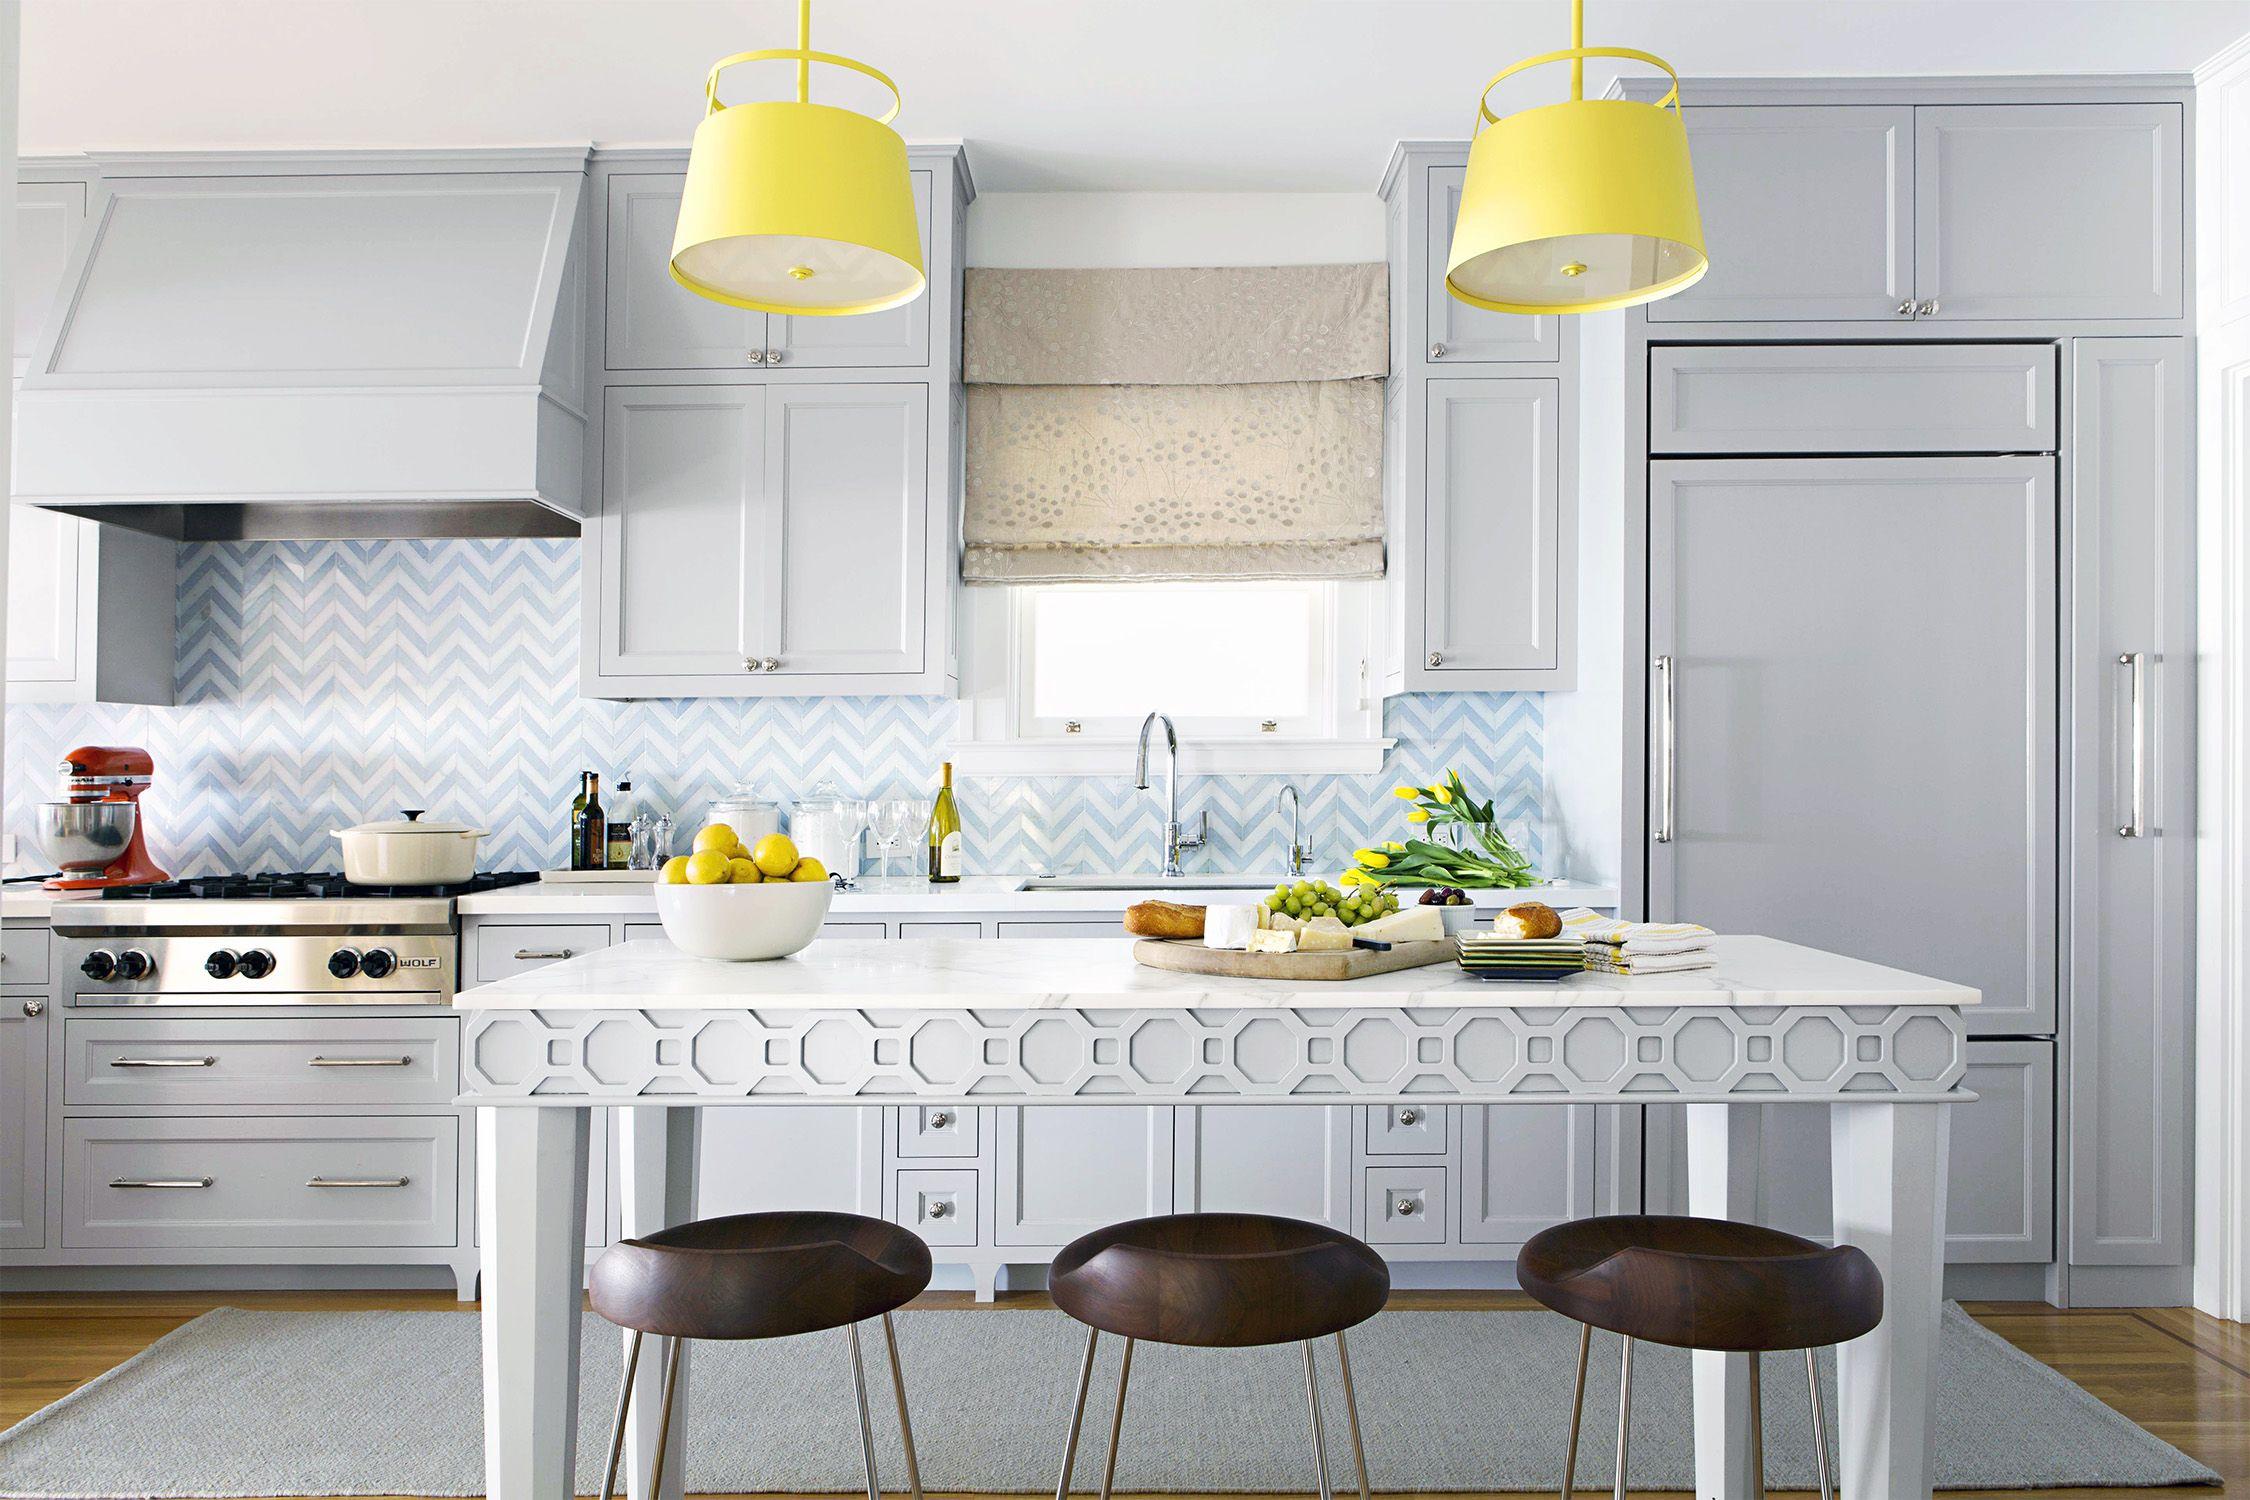 17 Best Kitchen Ideas - Decor and Decorating Ideas for Kitchen Design